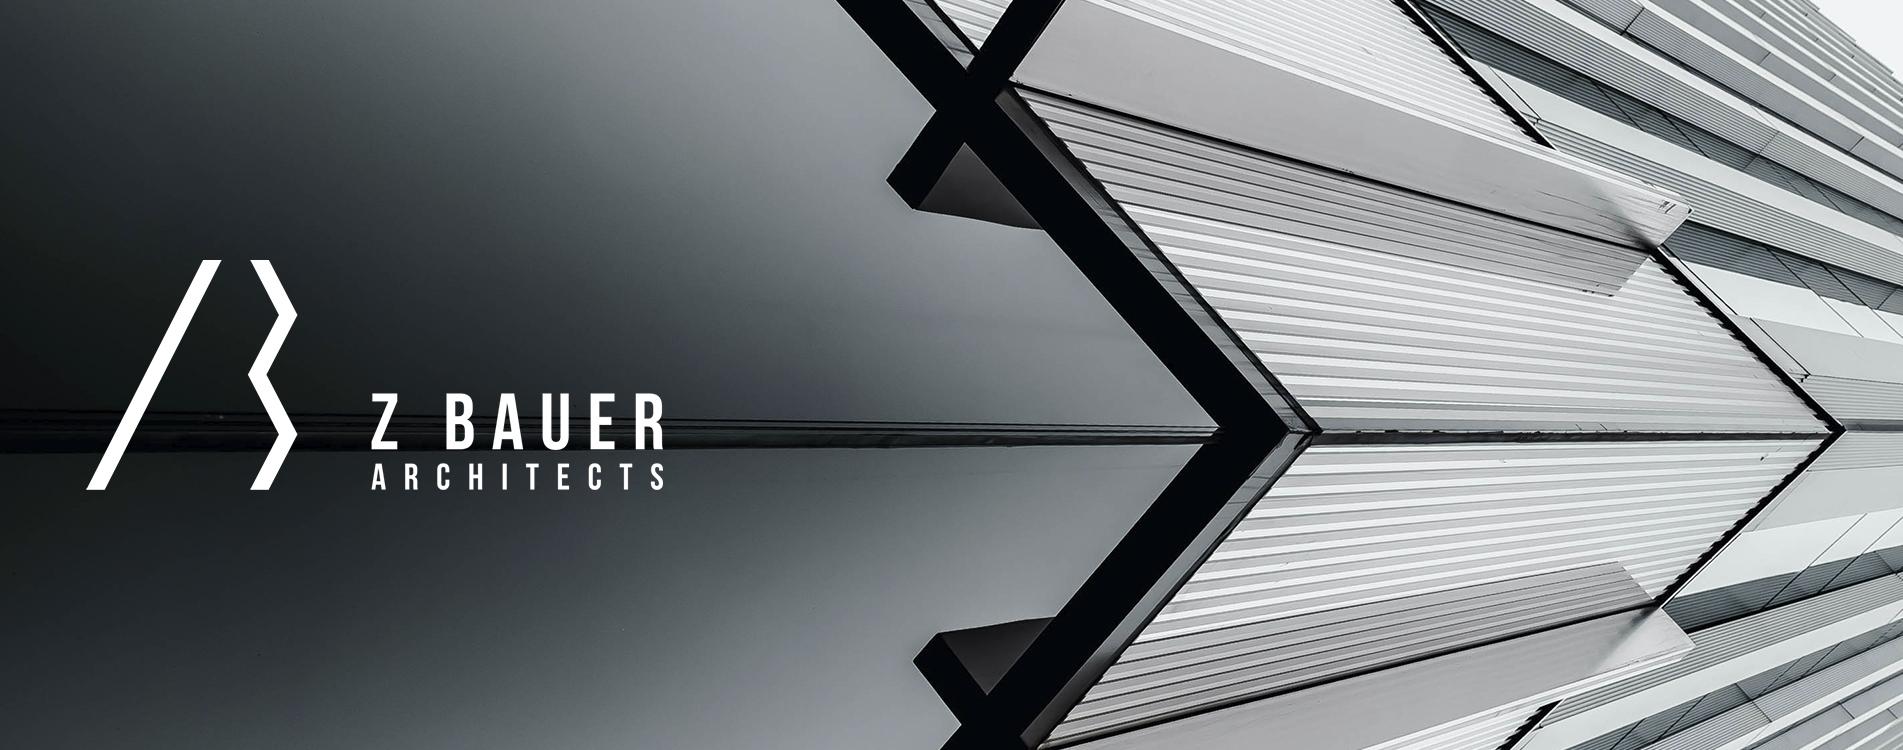 Z Bauer Architects Architect Place Brand 4